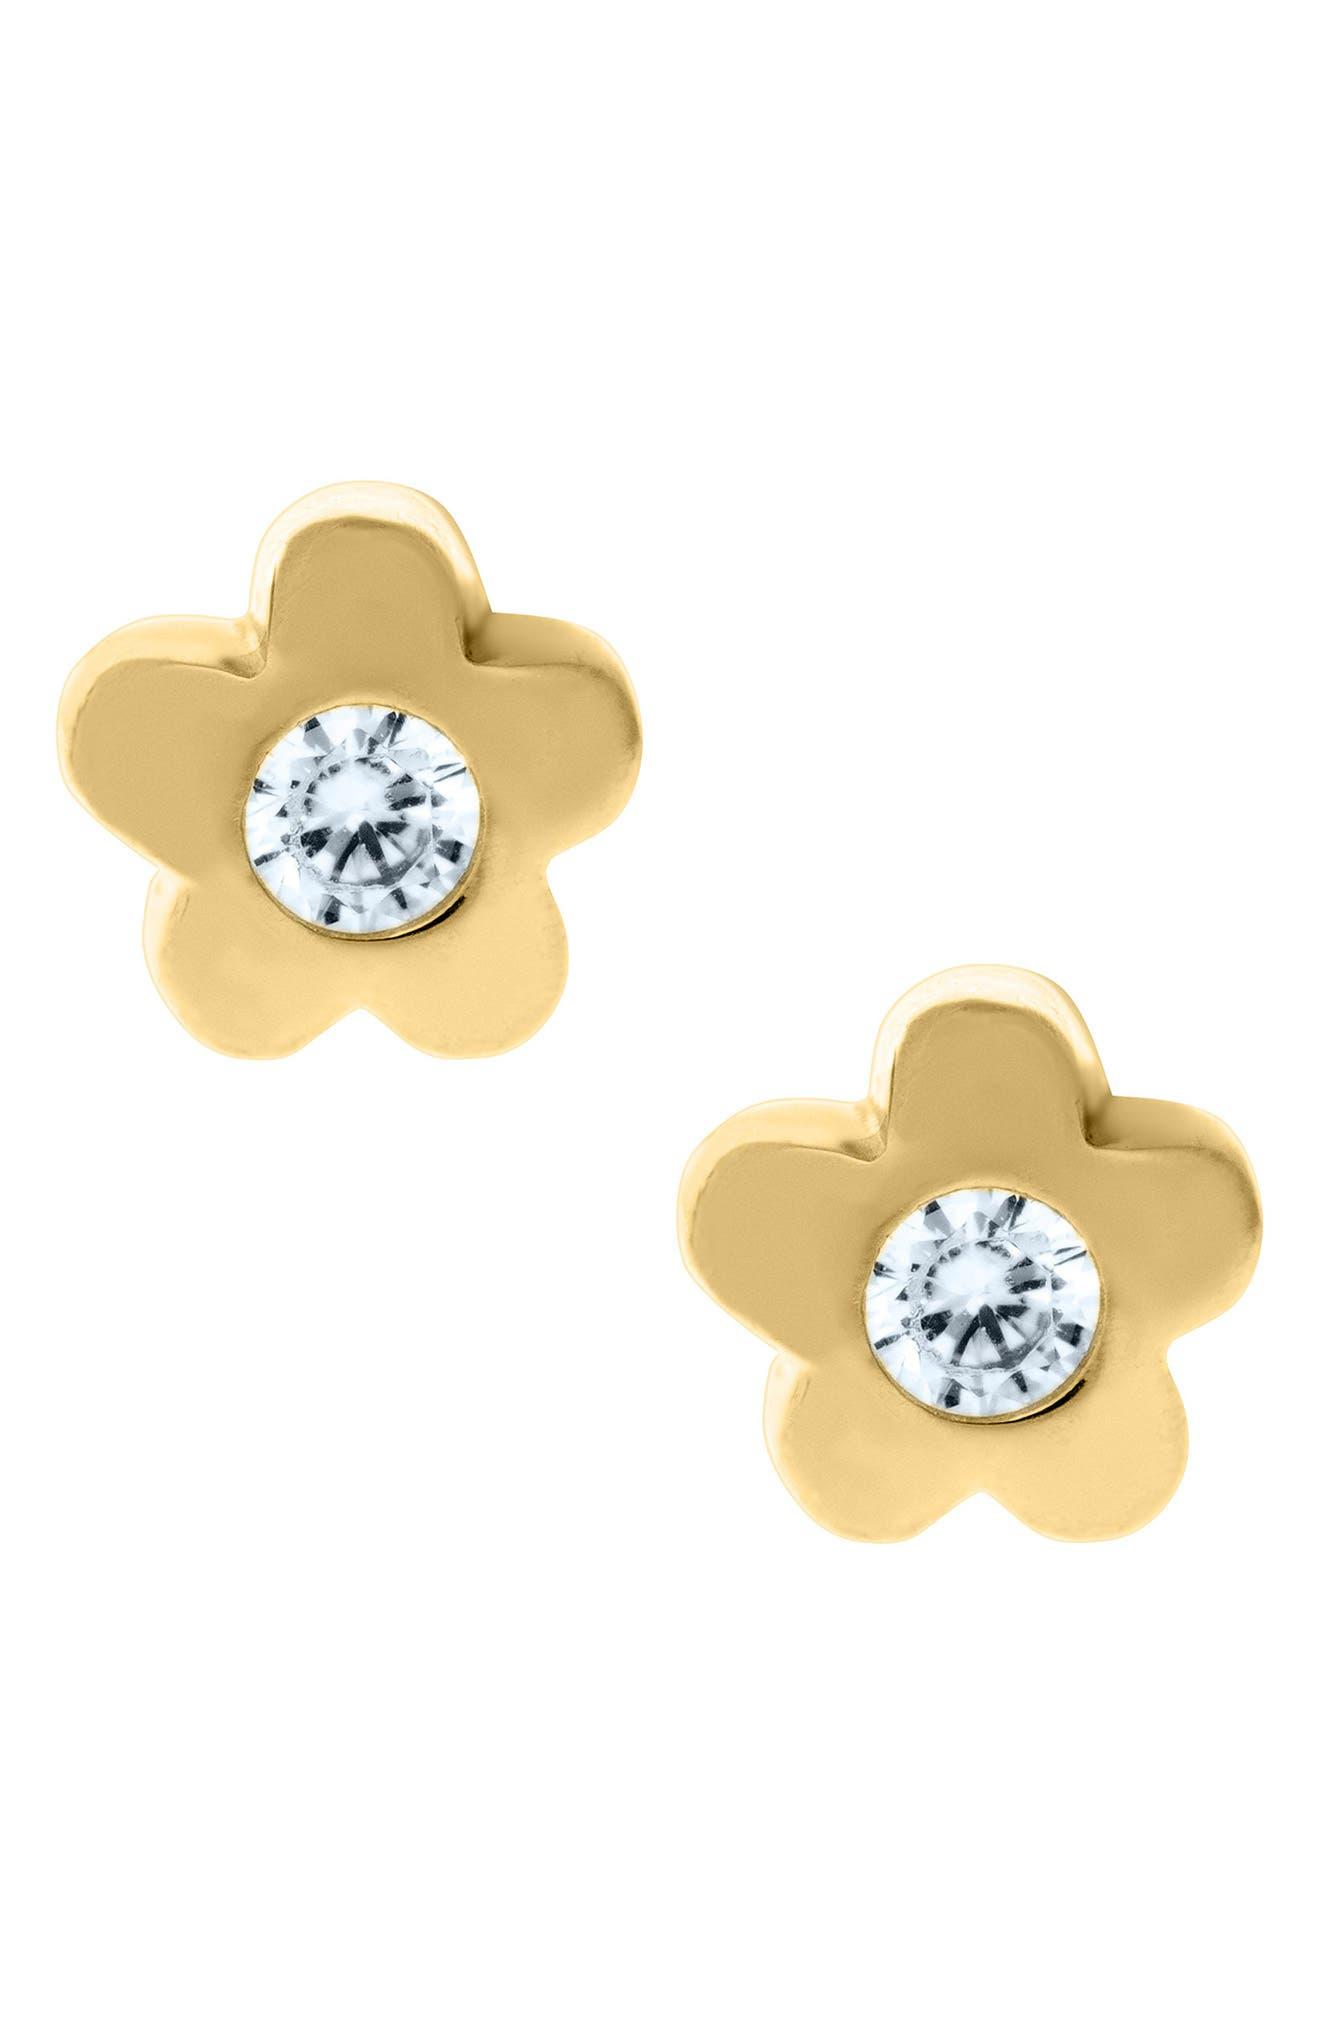 14k Gold & Cubic Zirconia Flower Earrings,                         Main,                         color, Gold